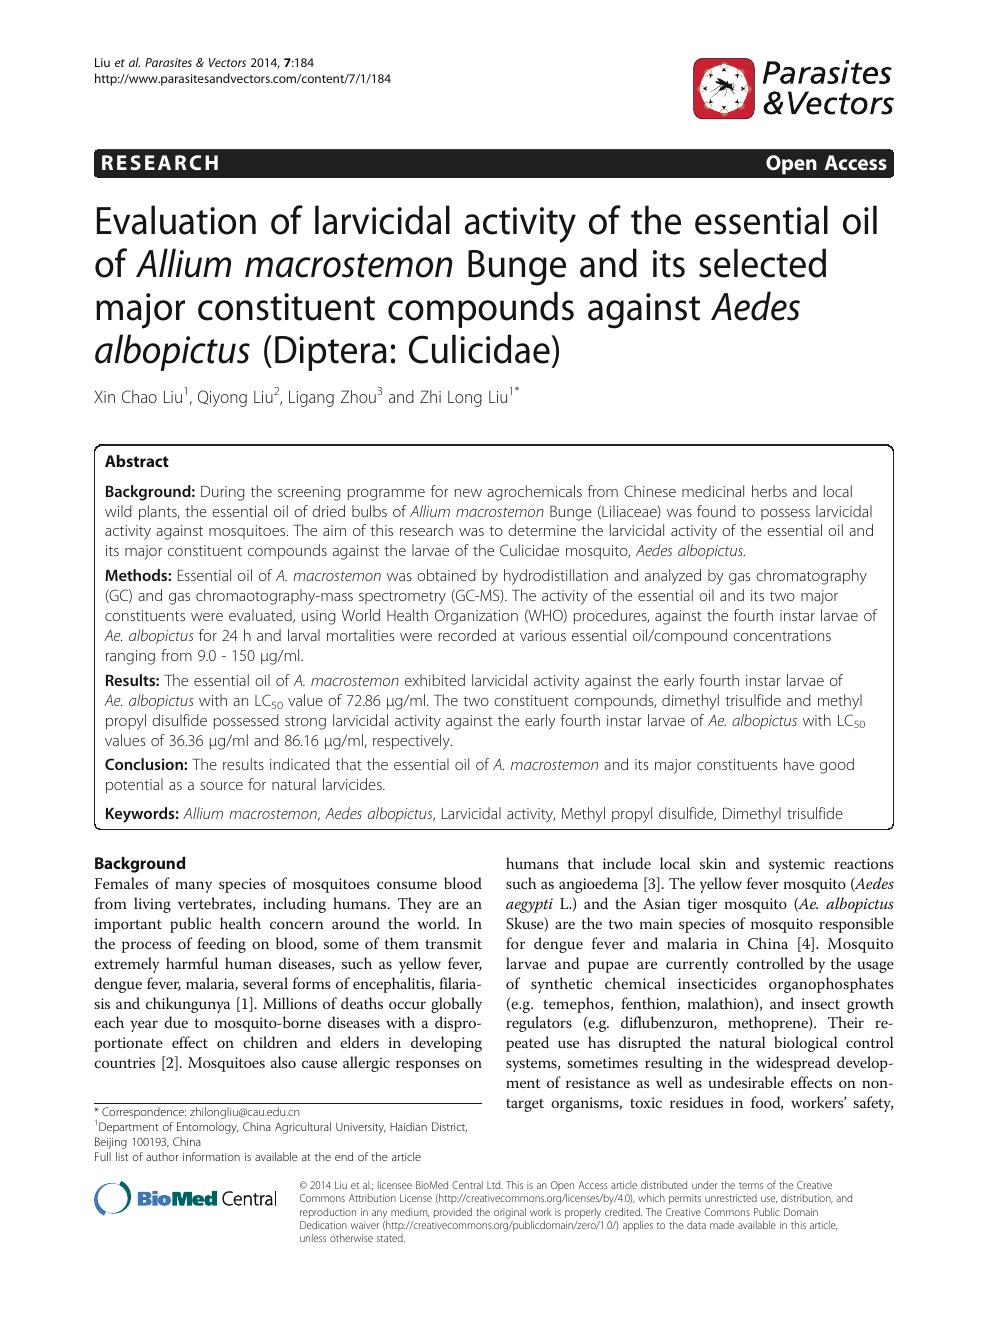 Evaluation of larvicidal activity of the essential oil of Allium